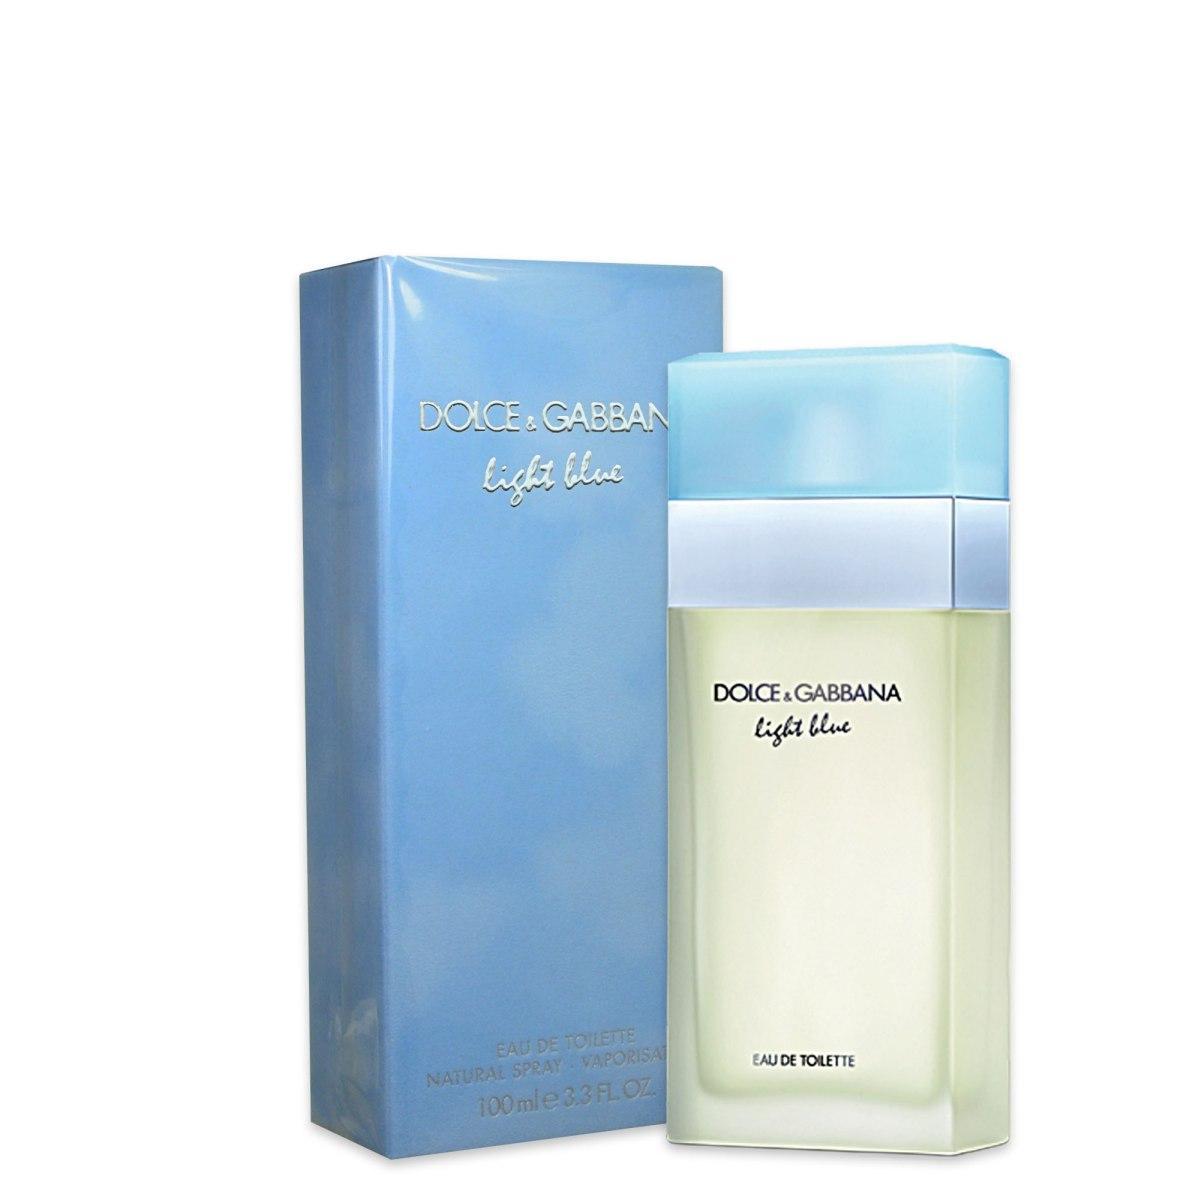 dolce gabbana dolce gabbana light blue 100ml femme d g7832 3423473020233. Black Bedroom Furniture Sets. Home Design Ideas